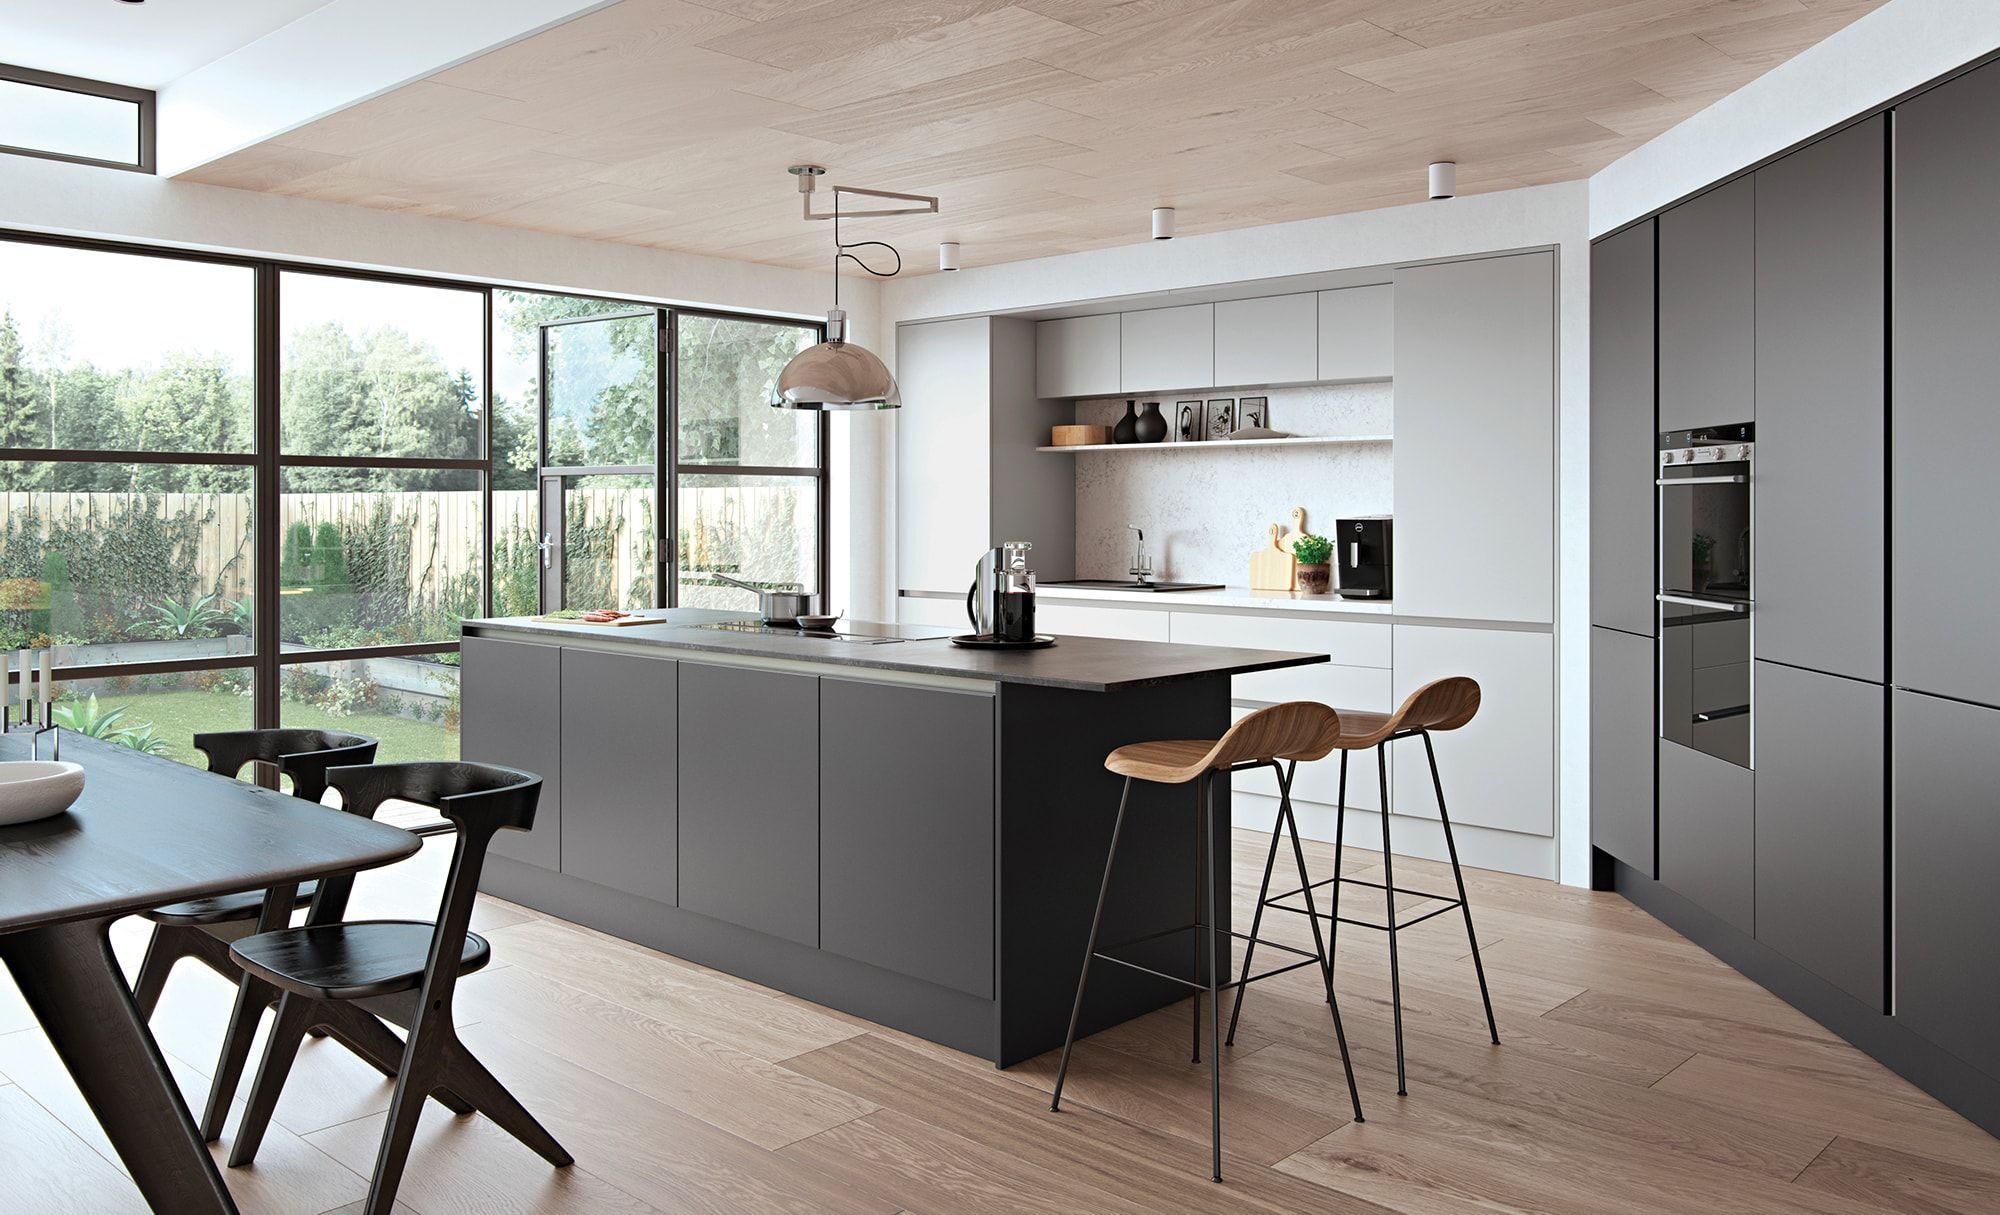 beautiful contemporary kitchen cabinets ideas contemporary kitchen cabinets handleless on kitchen ideas gray id=42638